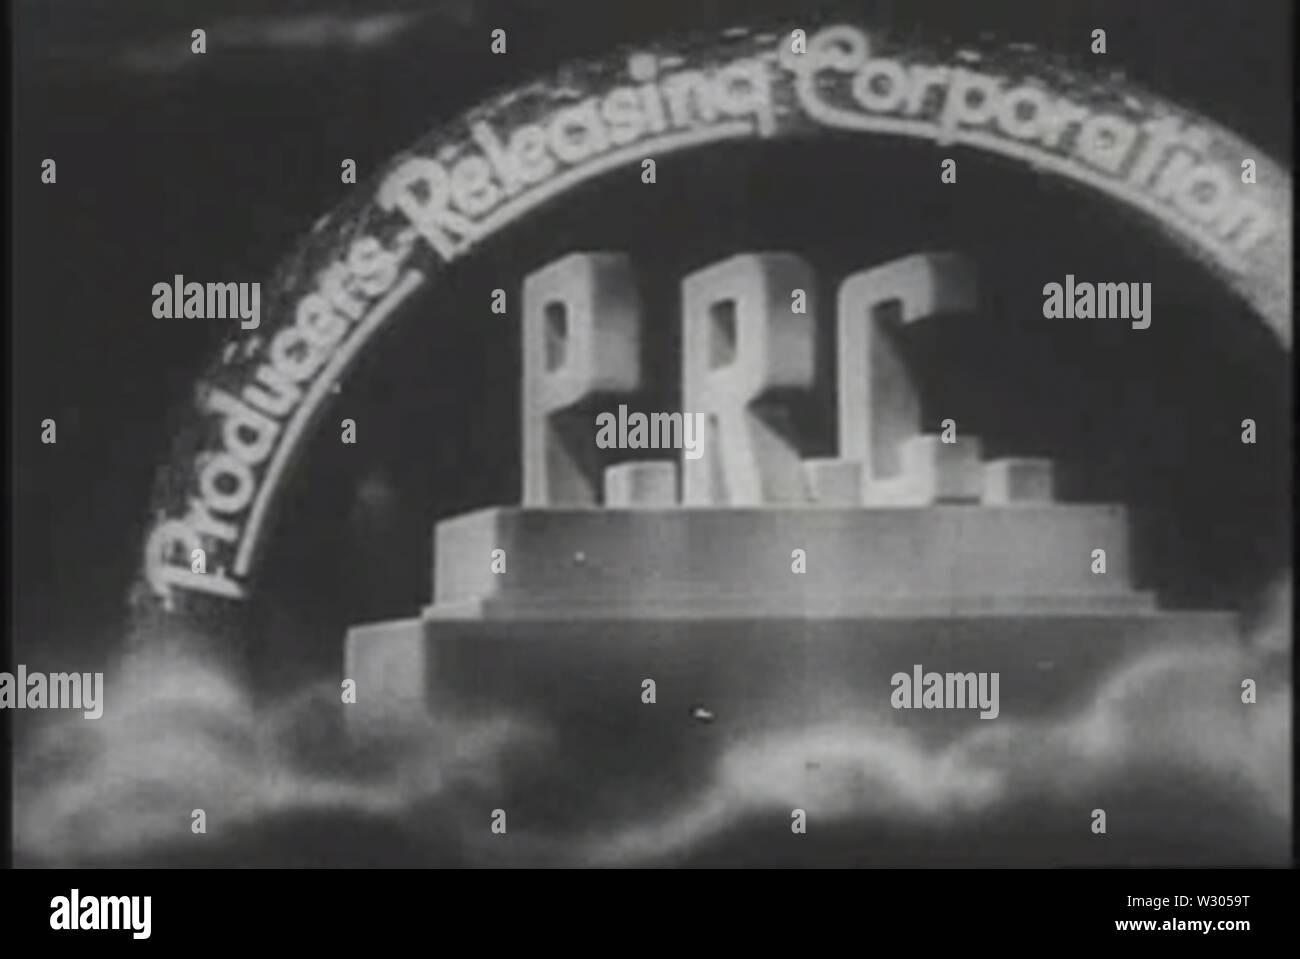 PRC logo 1940 - Stock Image